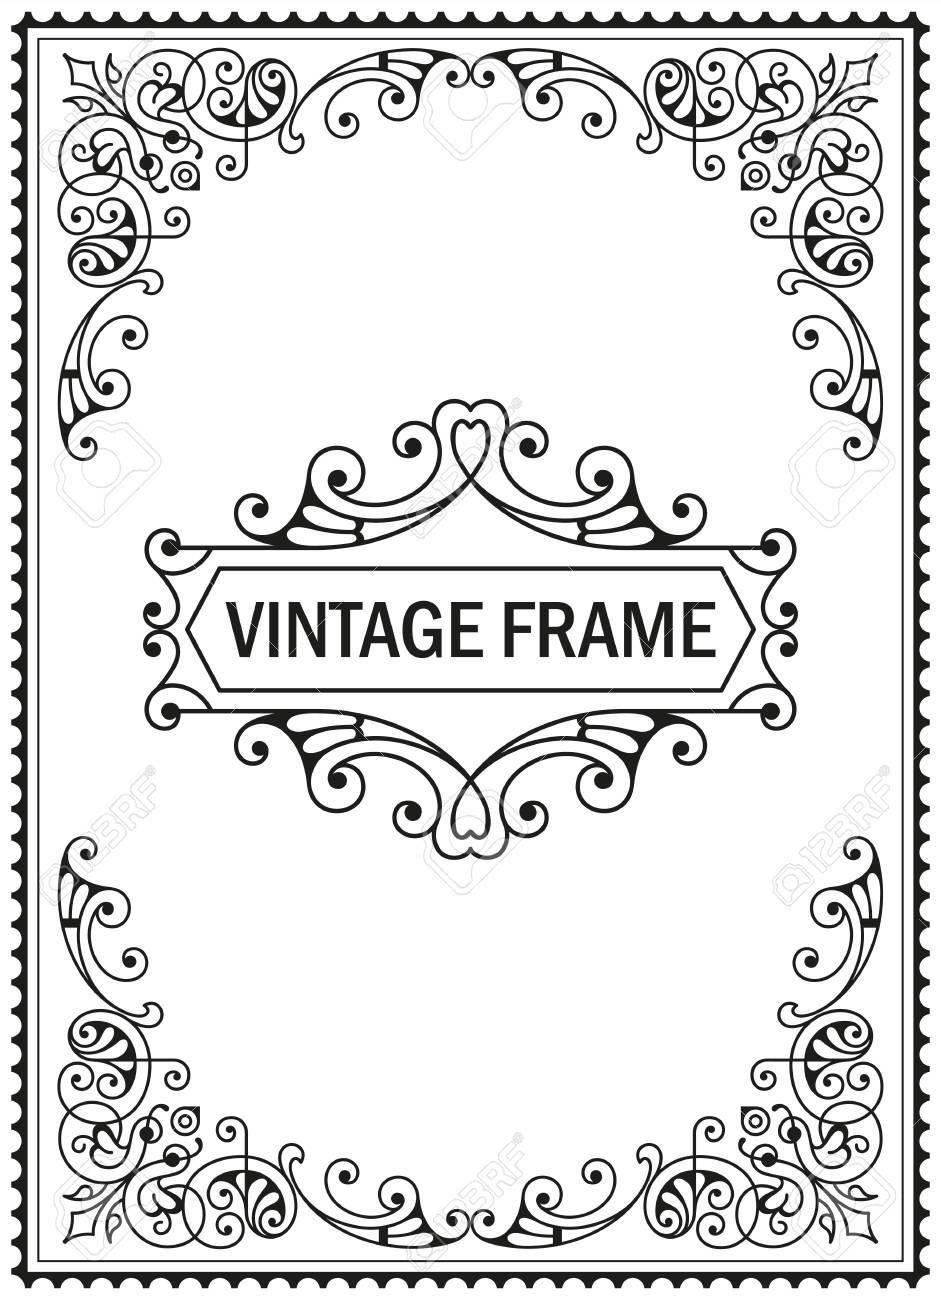 Flourish border corner and frame decorative elements for design flourish border corner and frame decorative elements for design invitations frames menus stock stopboris Image collections